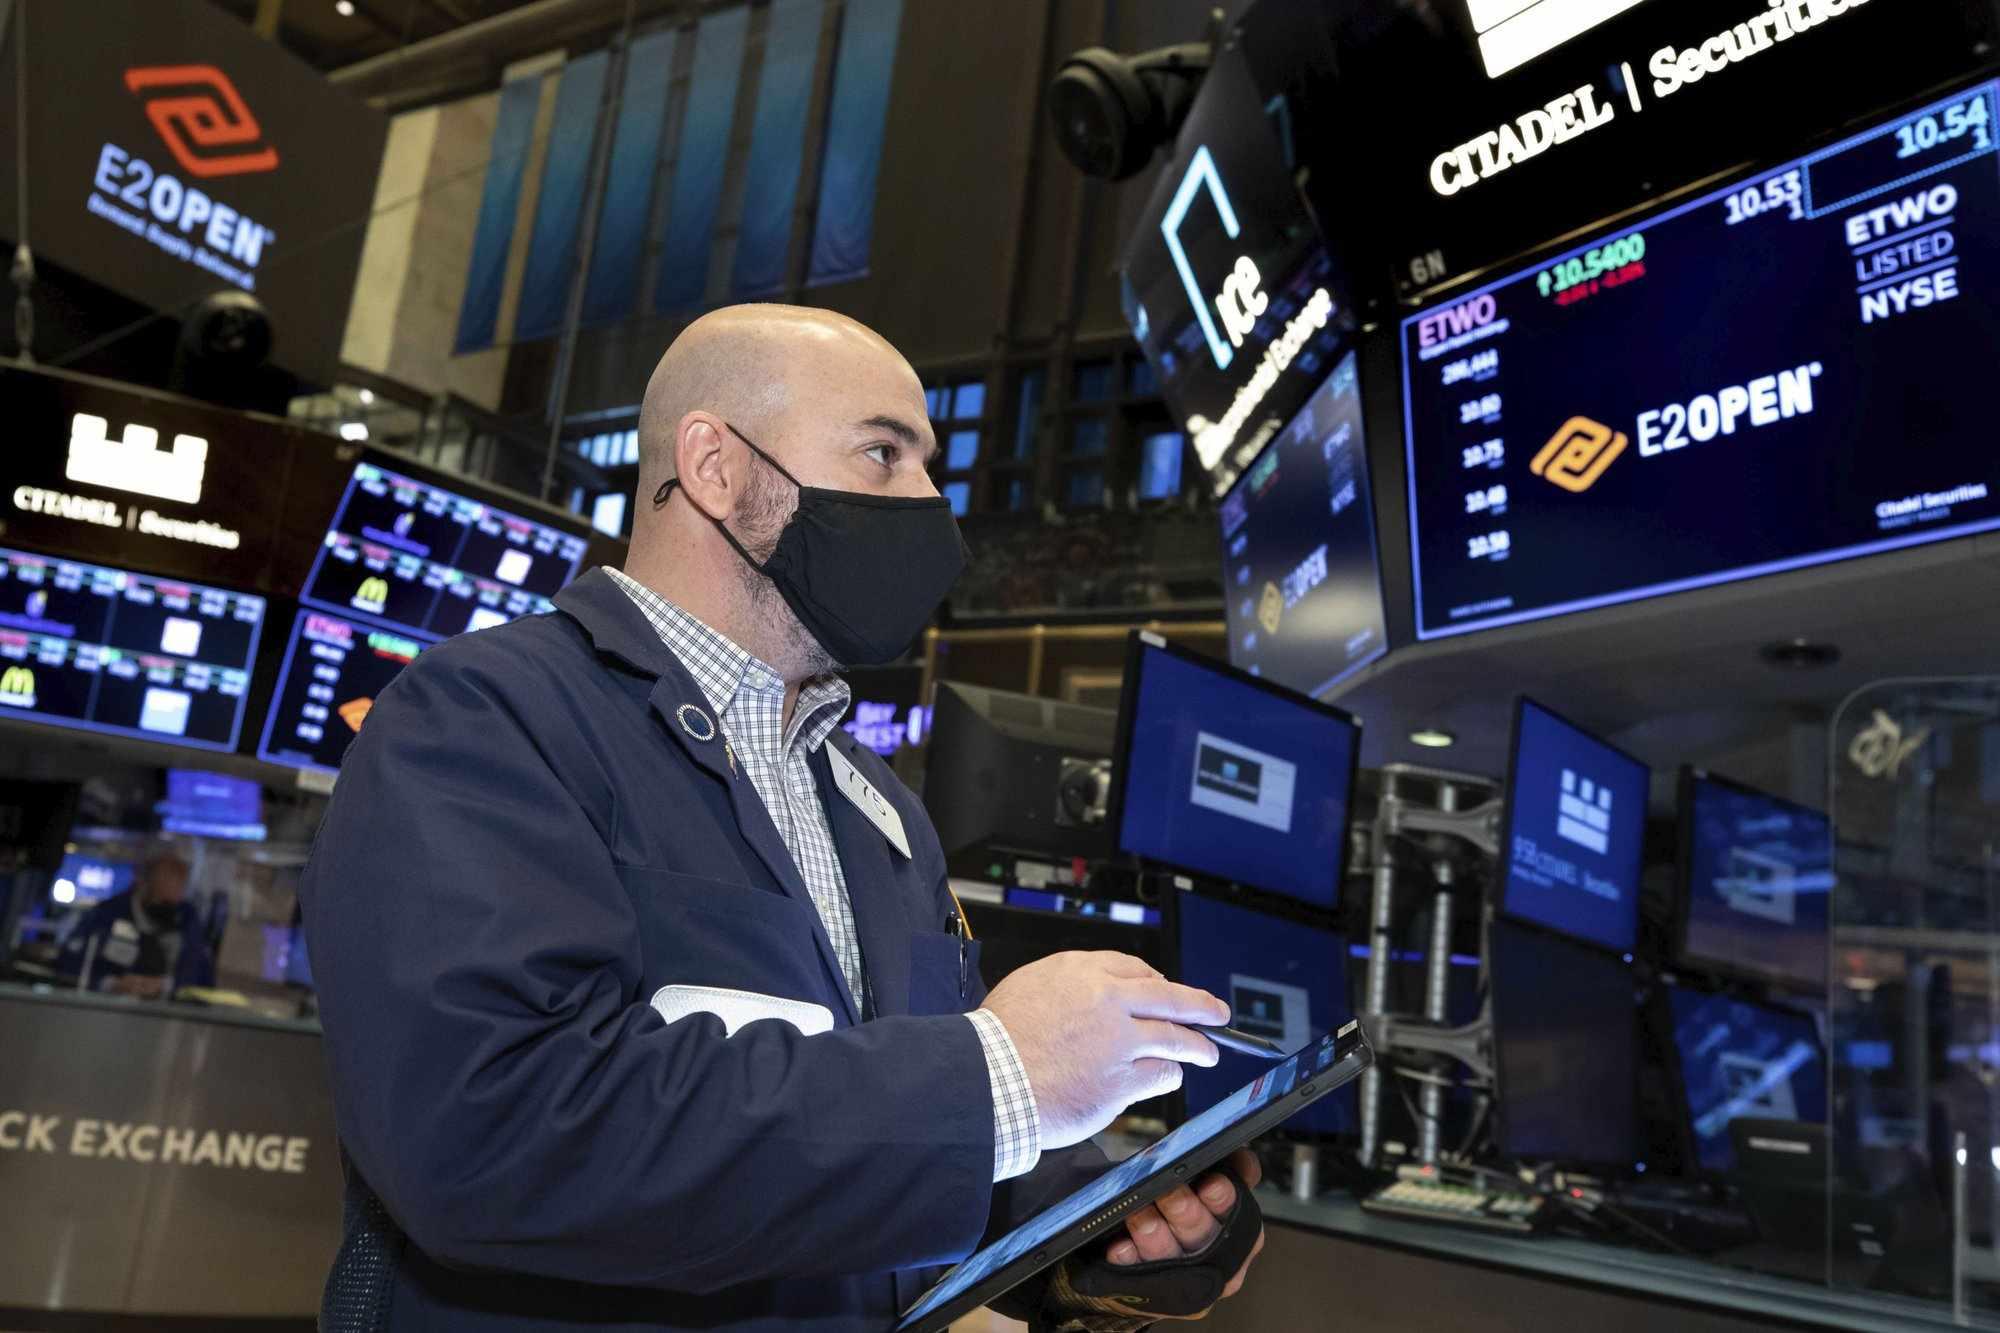 wall-street stocks rose coronavirus corporate